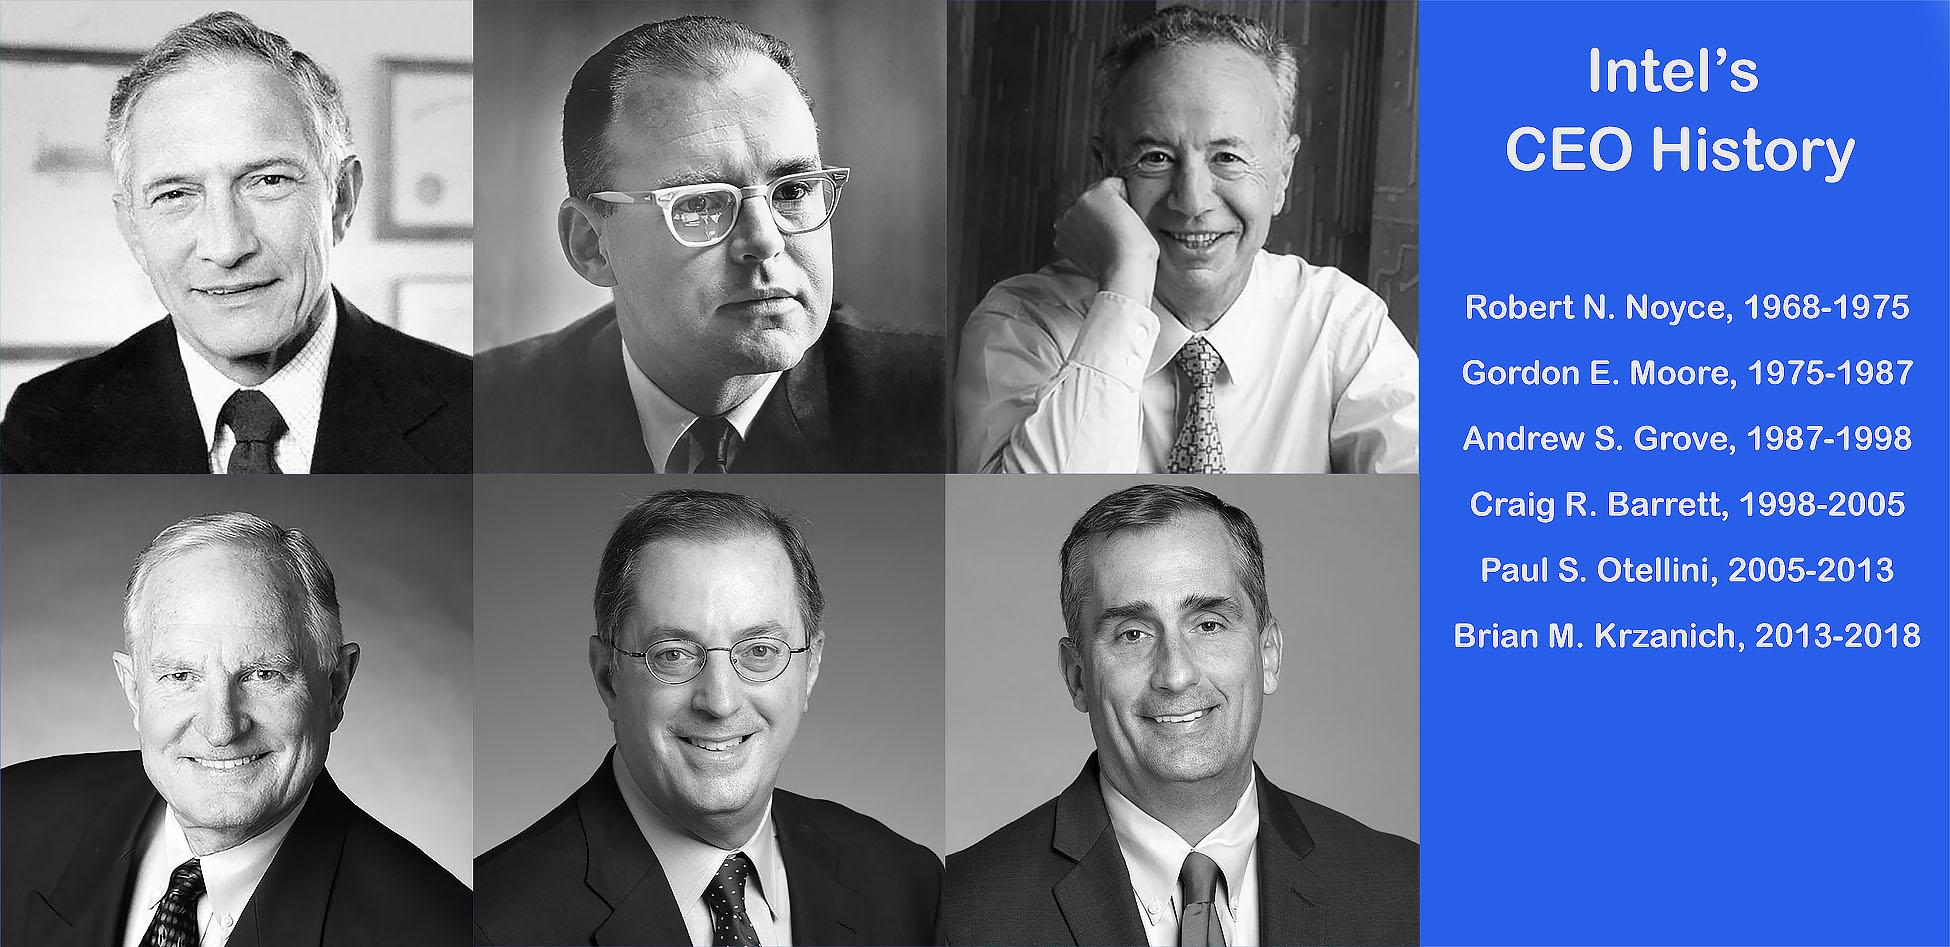 Intel'™s CEO History